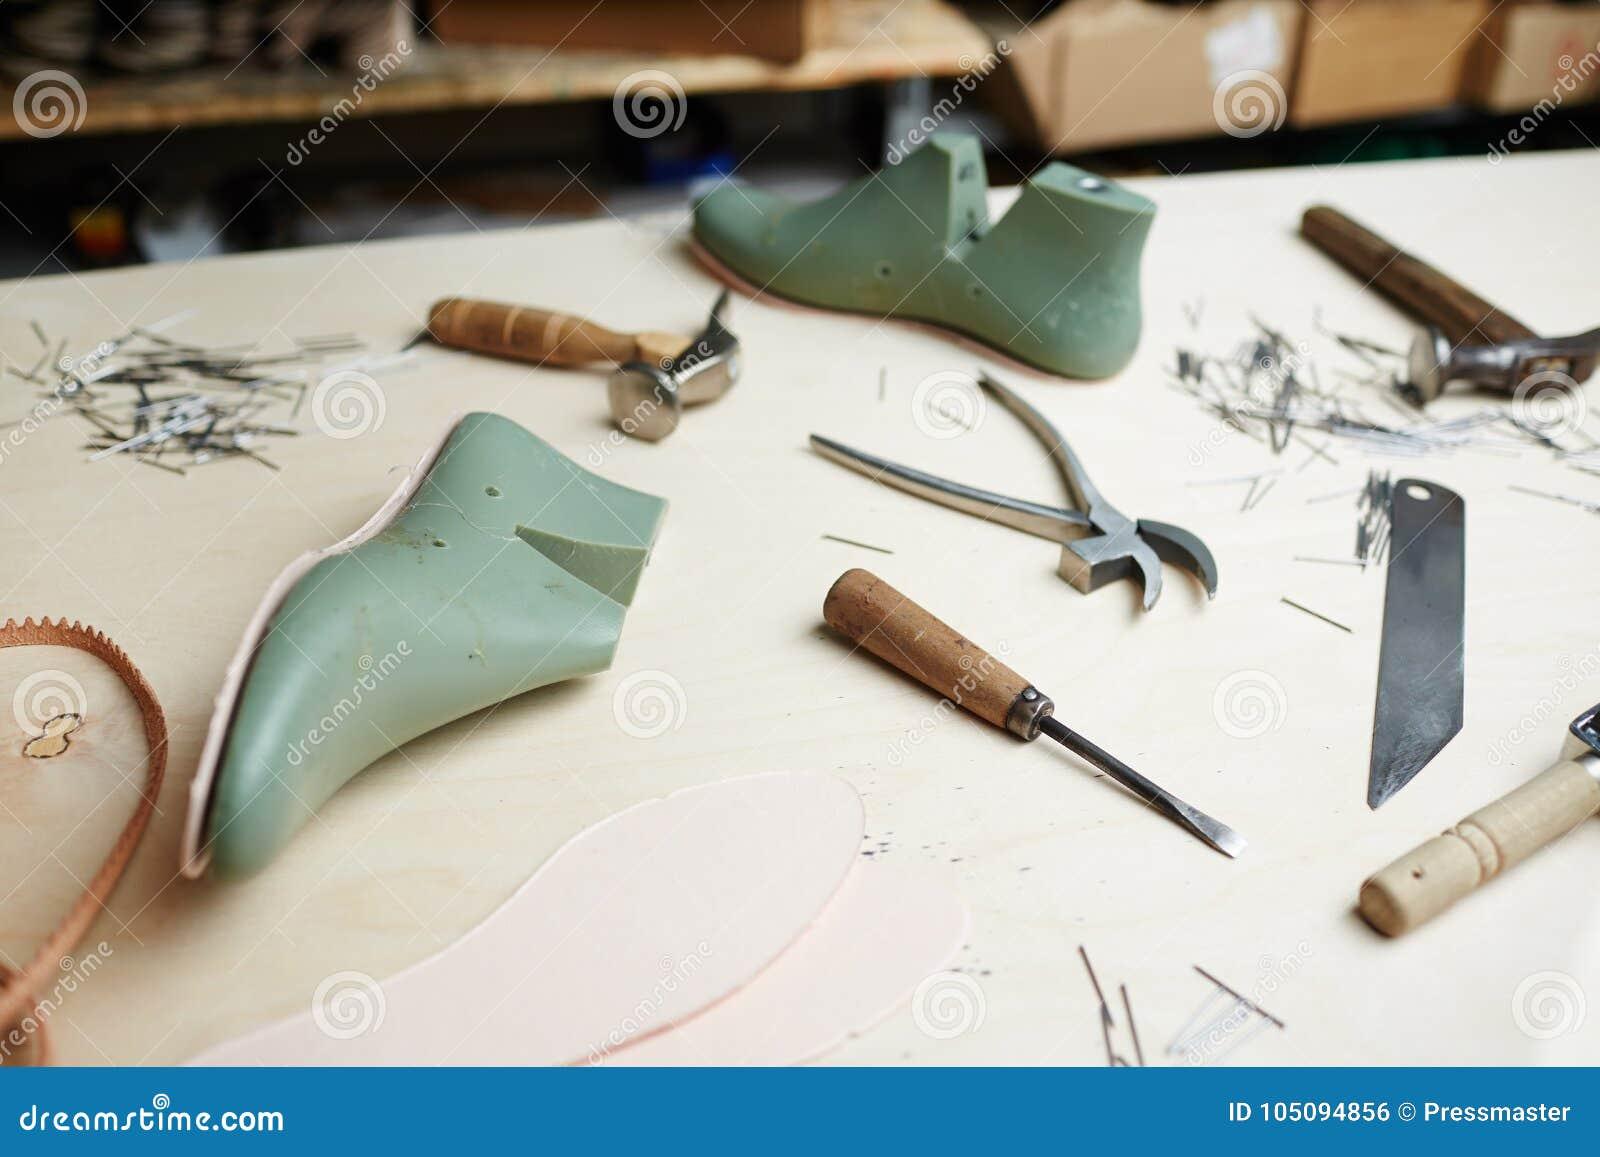 Shoemaking supplies